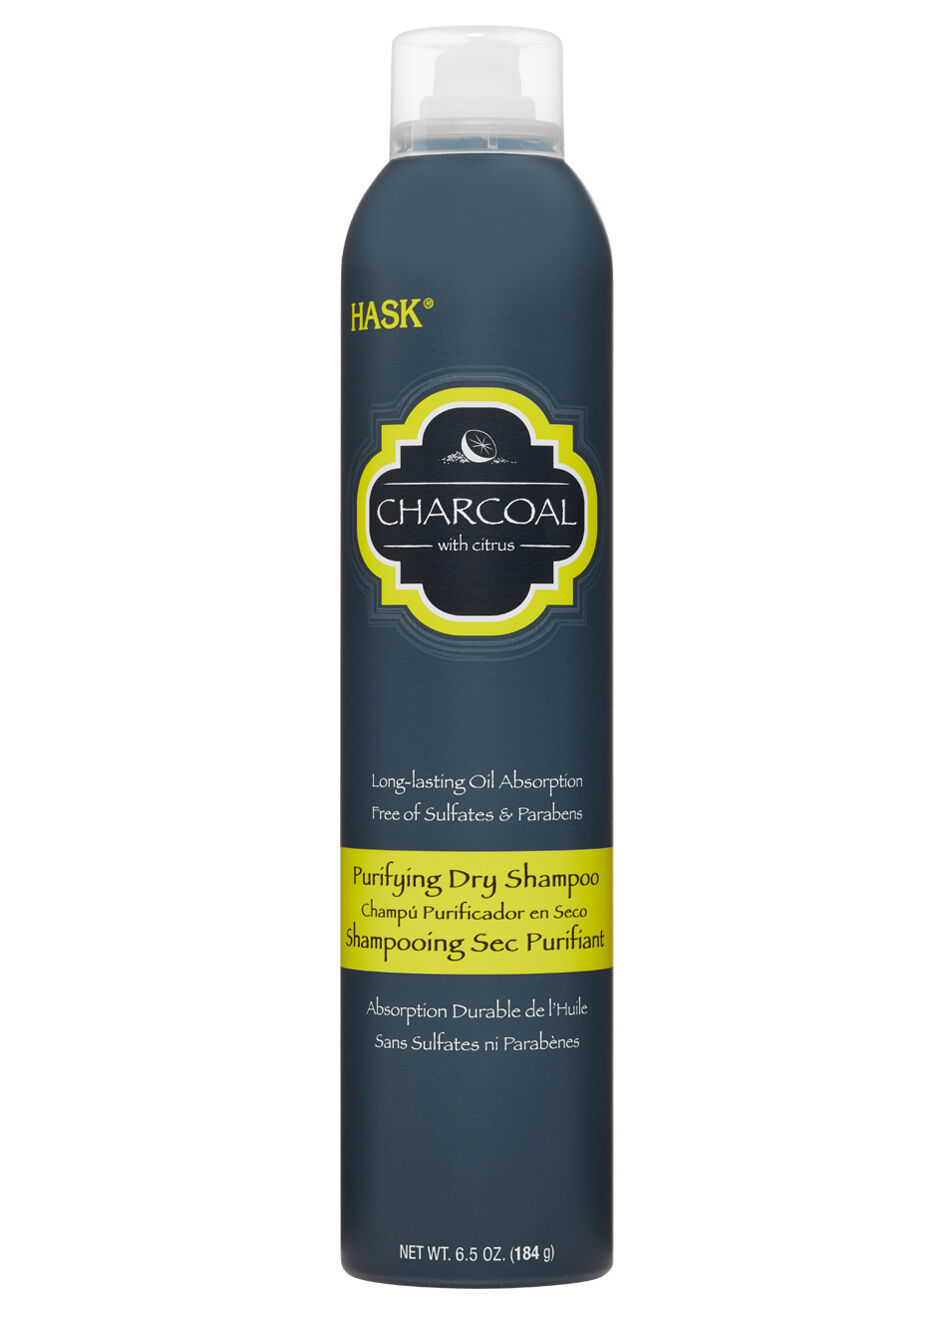 HASK Charcoal Purifying Dry Shampoo Long Lasting Hair Oil Ap